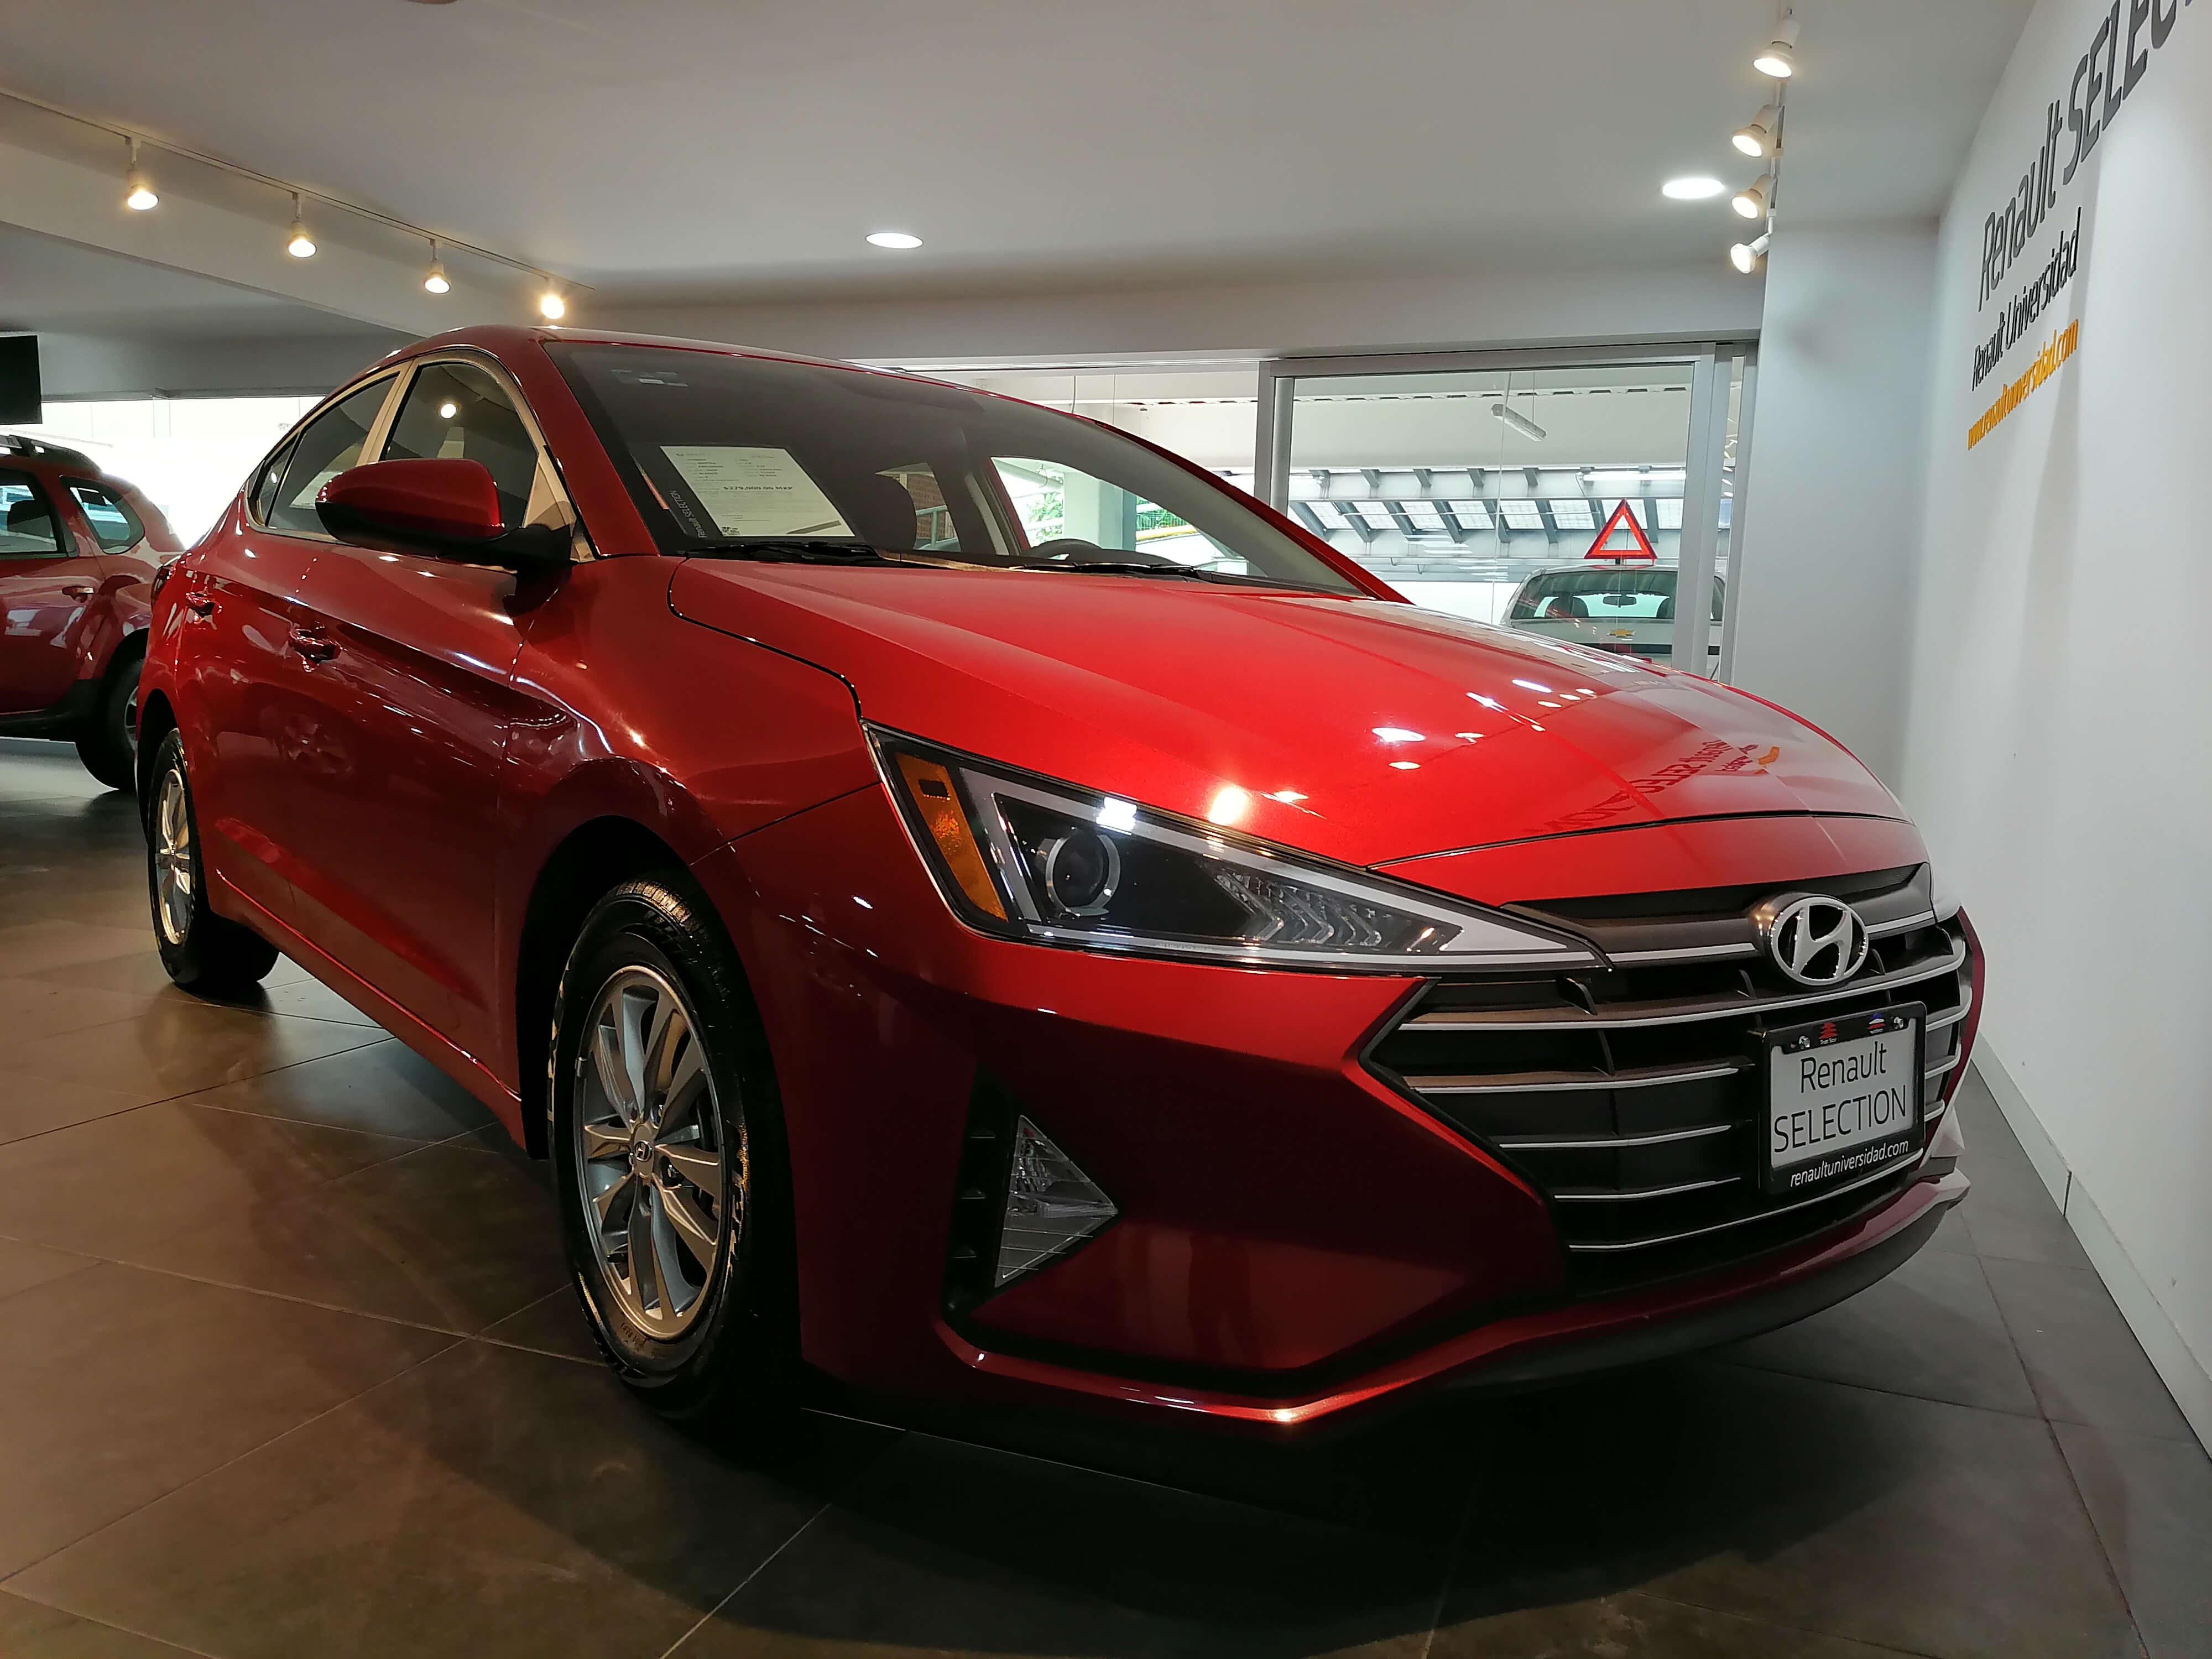 Hyundai Elantra 269,000